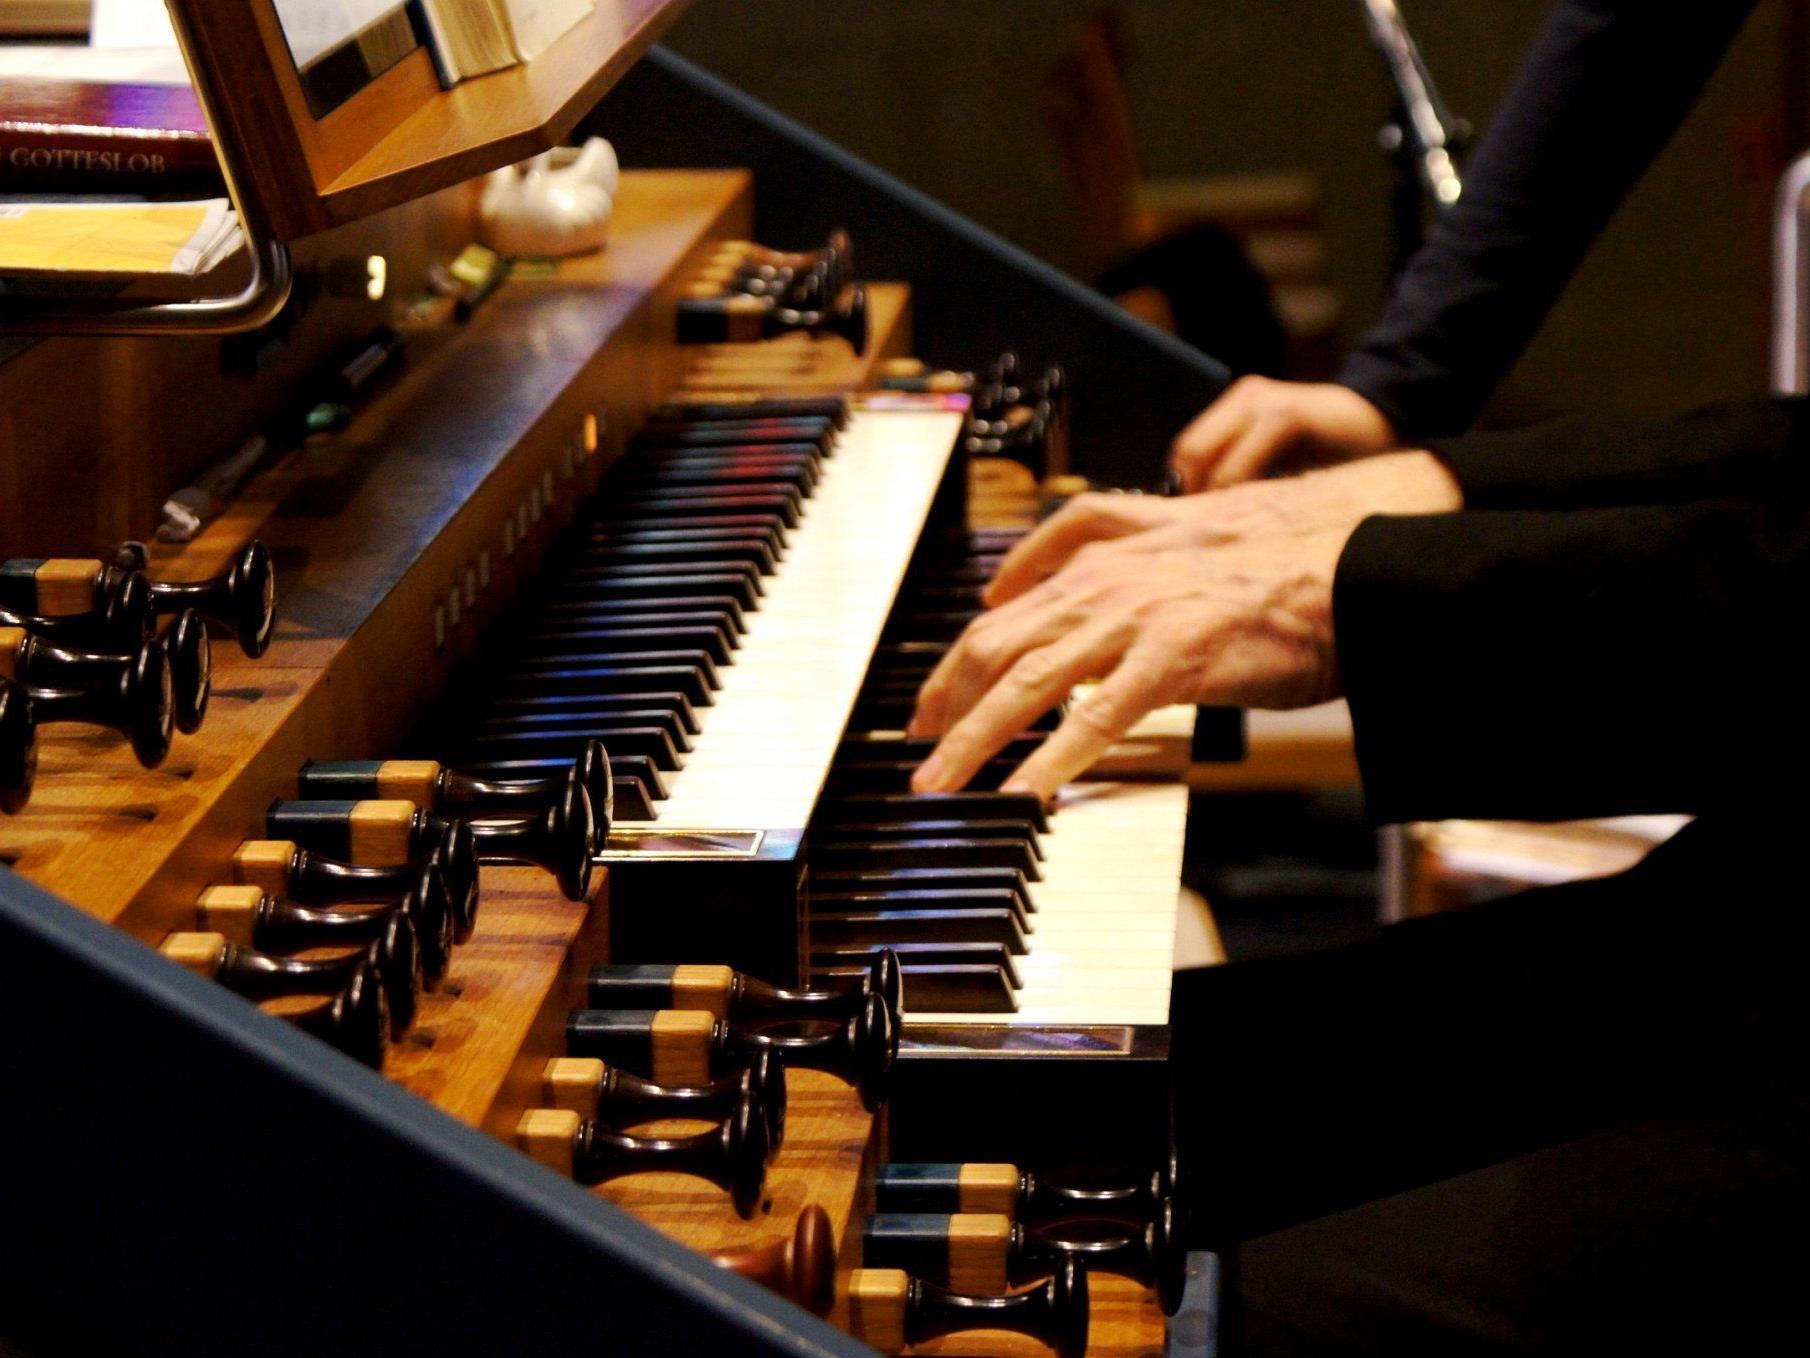 Orgelkunst in reinster Form